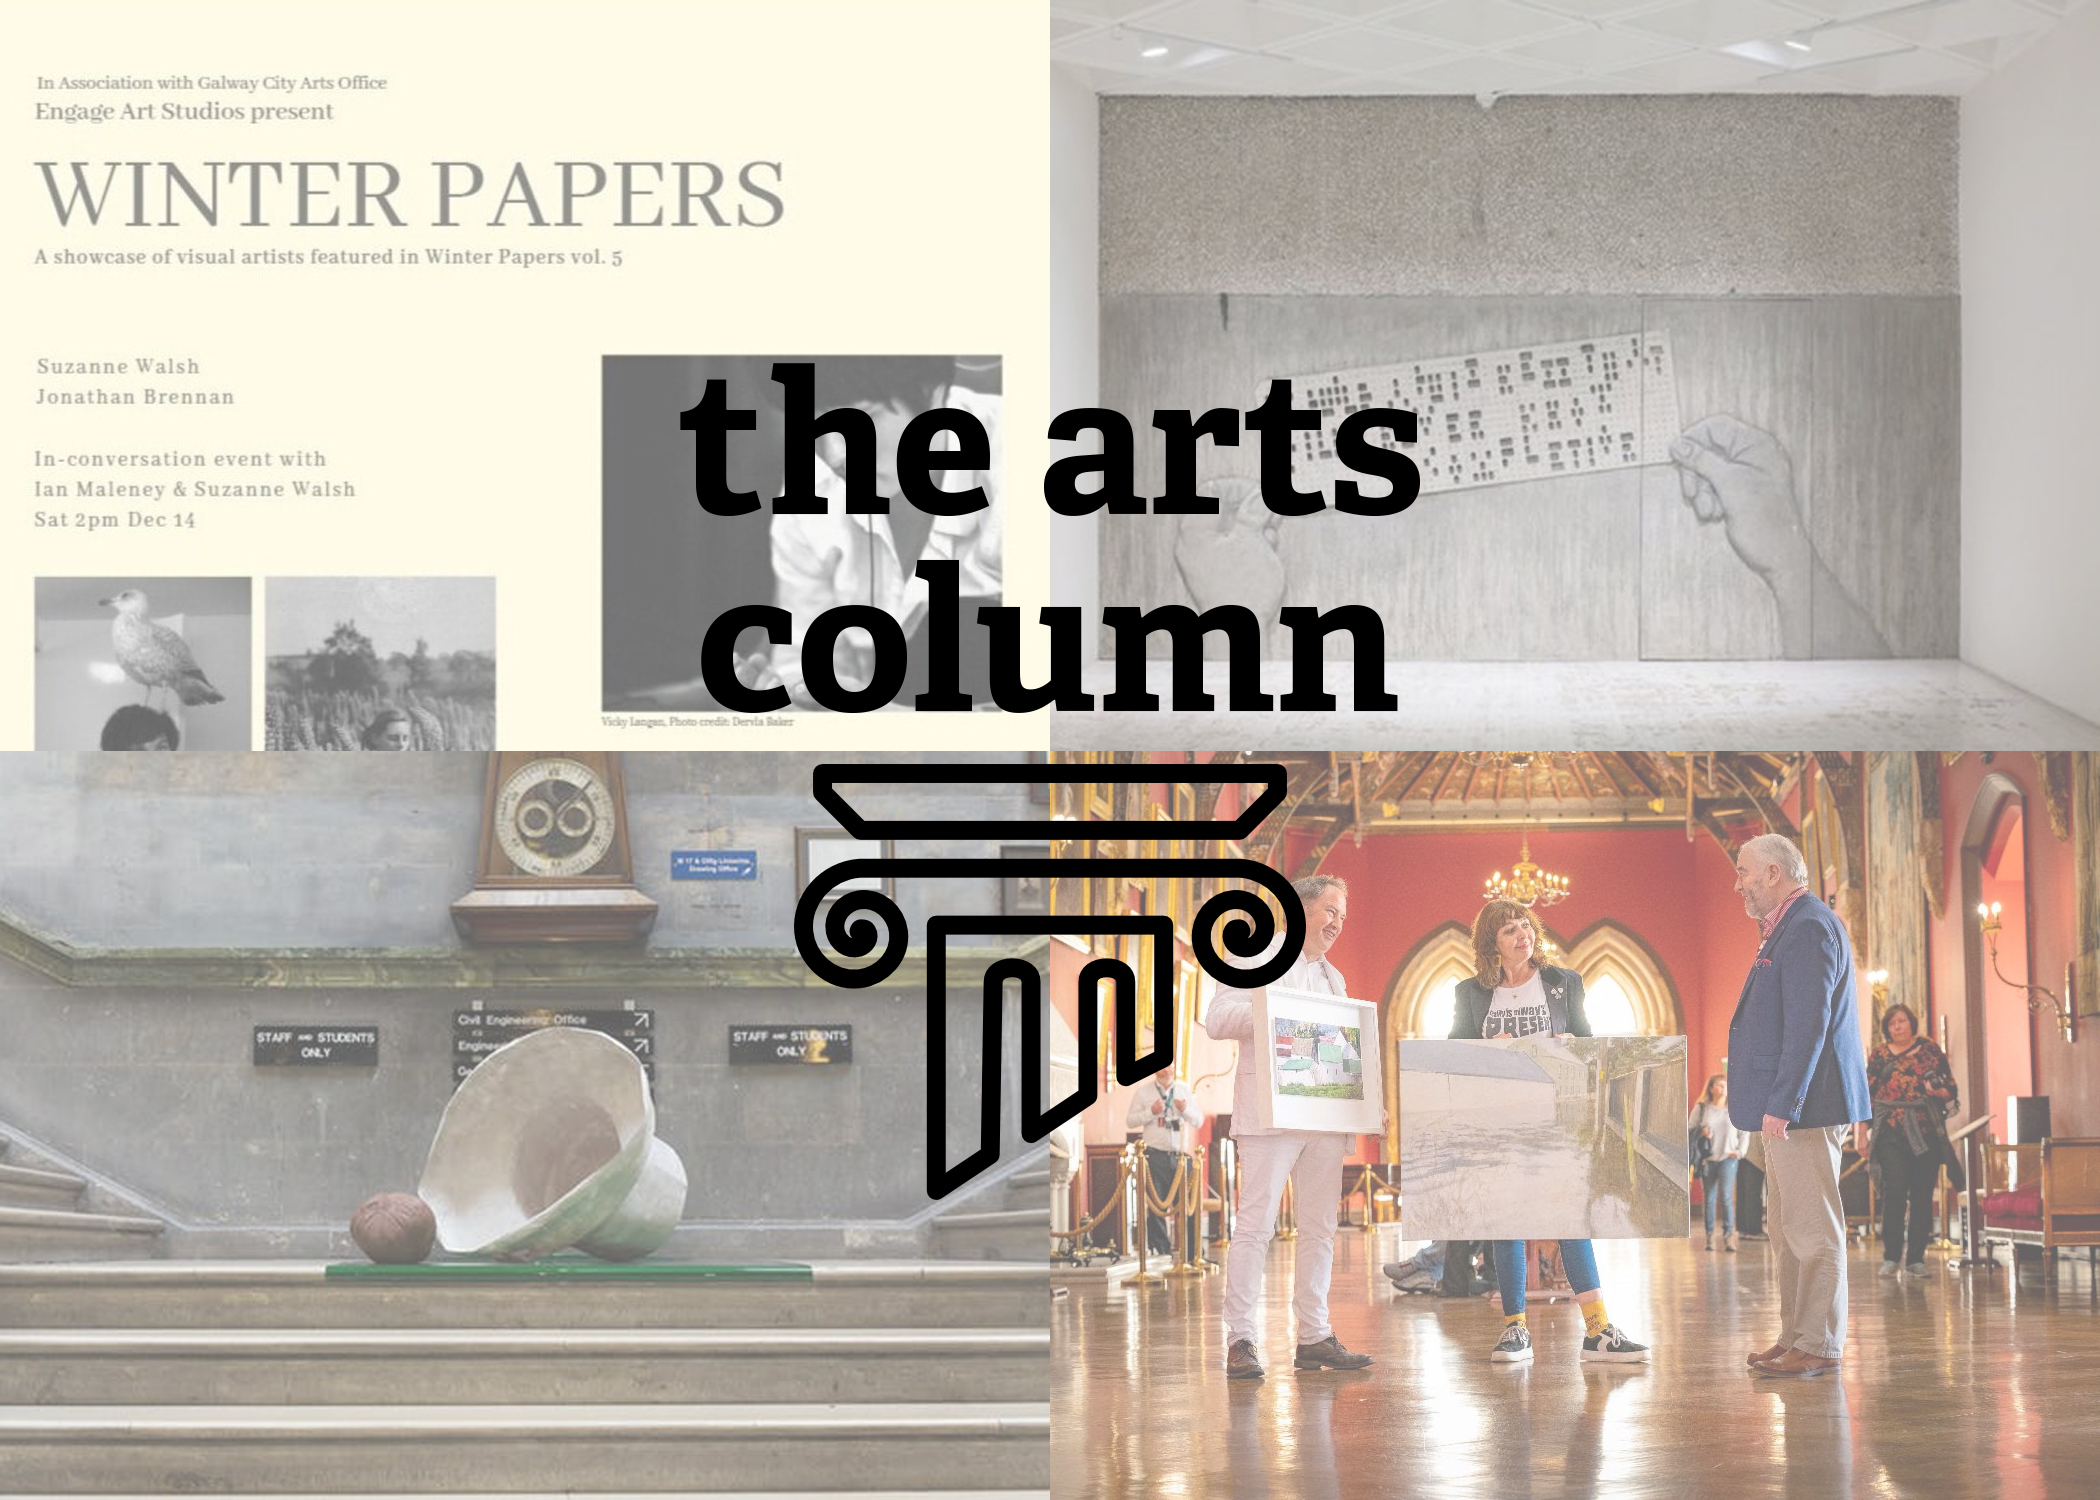 the_arts_column_31